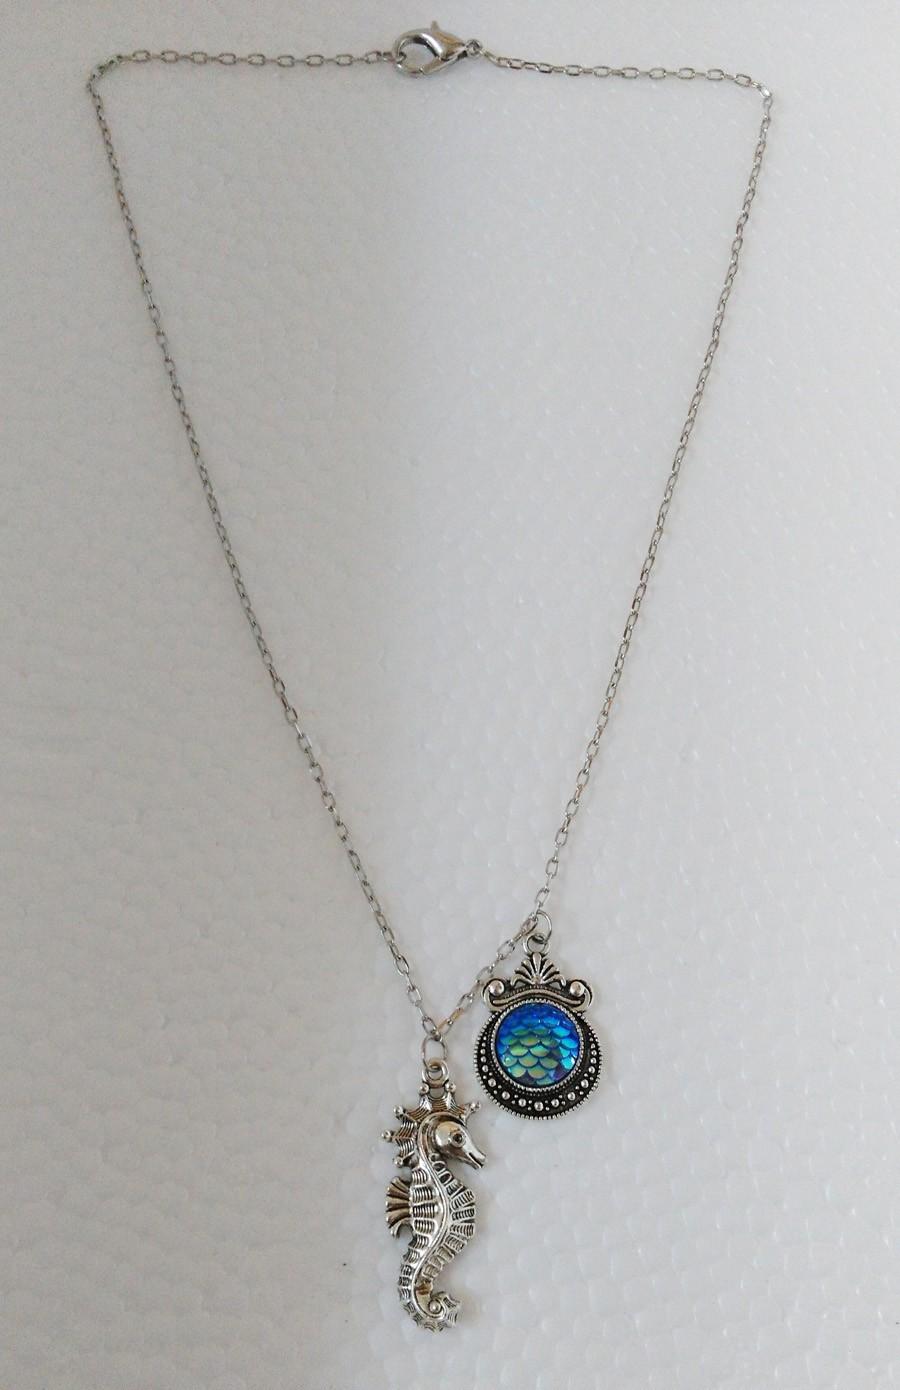 Art Deco Necklace ~ White Enamel Dragon Scales  Mermaid Tail Print Pendant Necklace